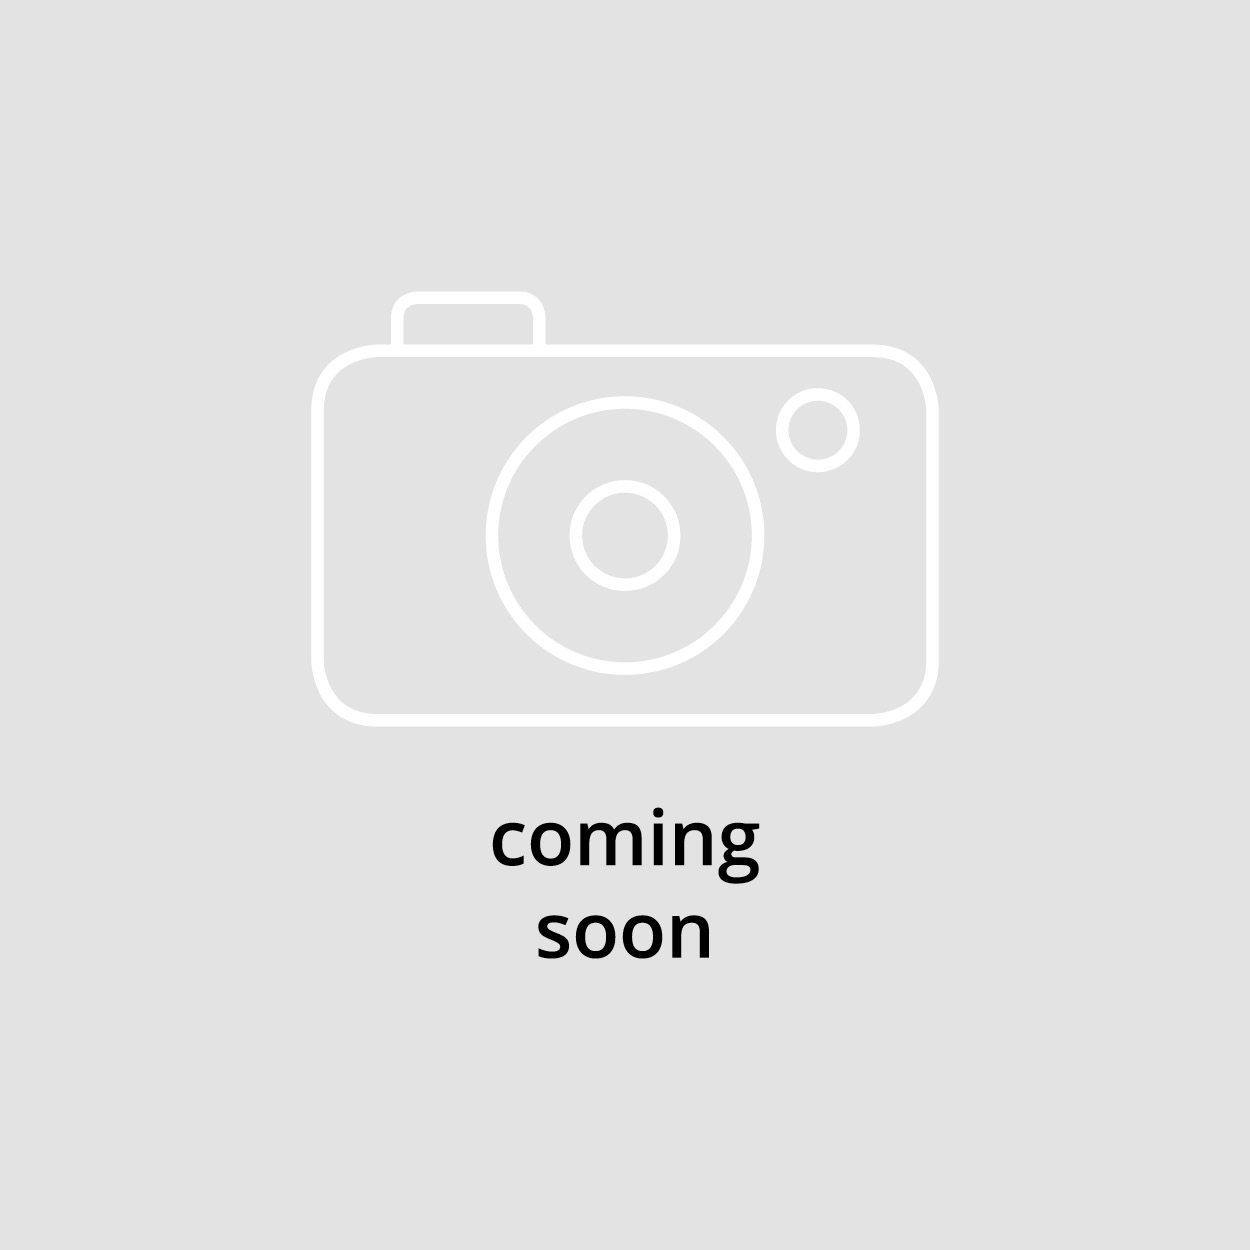 08.01.101 Mandrino principale per Gildemeister AS16, AS20